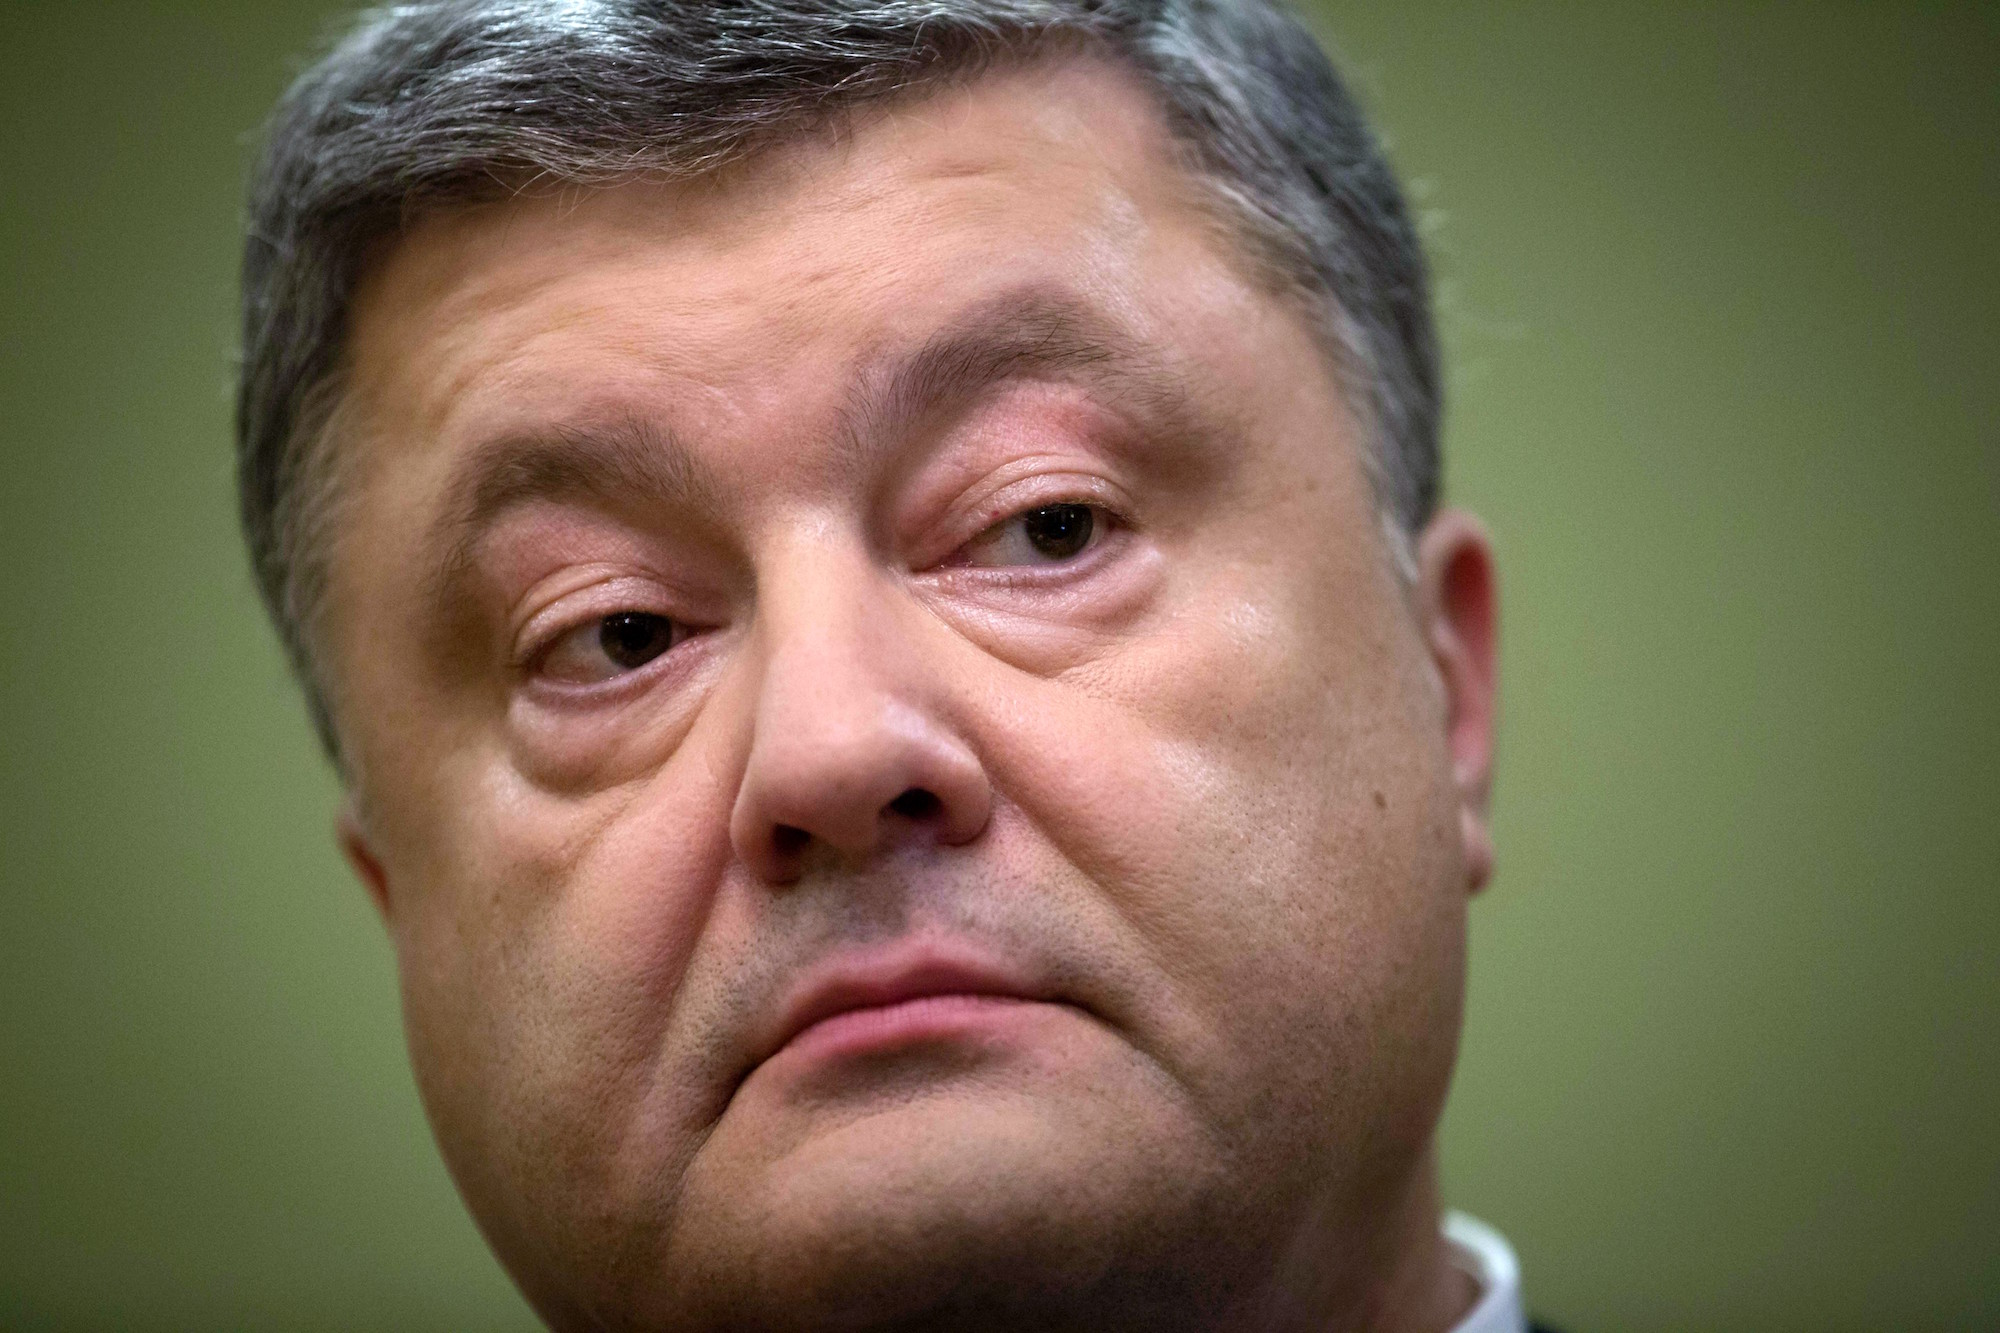 <p>Фото: &copy; РИА Новости/Михаил Палинчак</p>